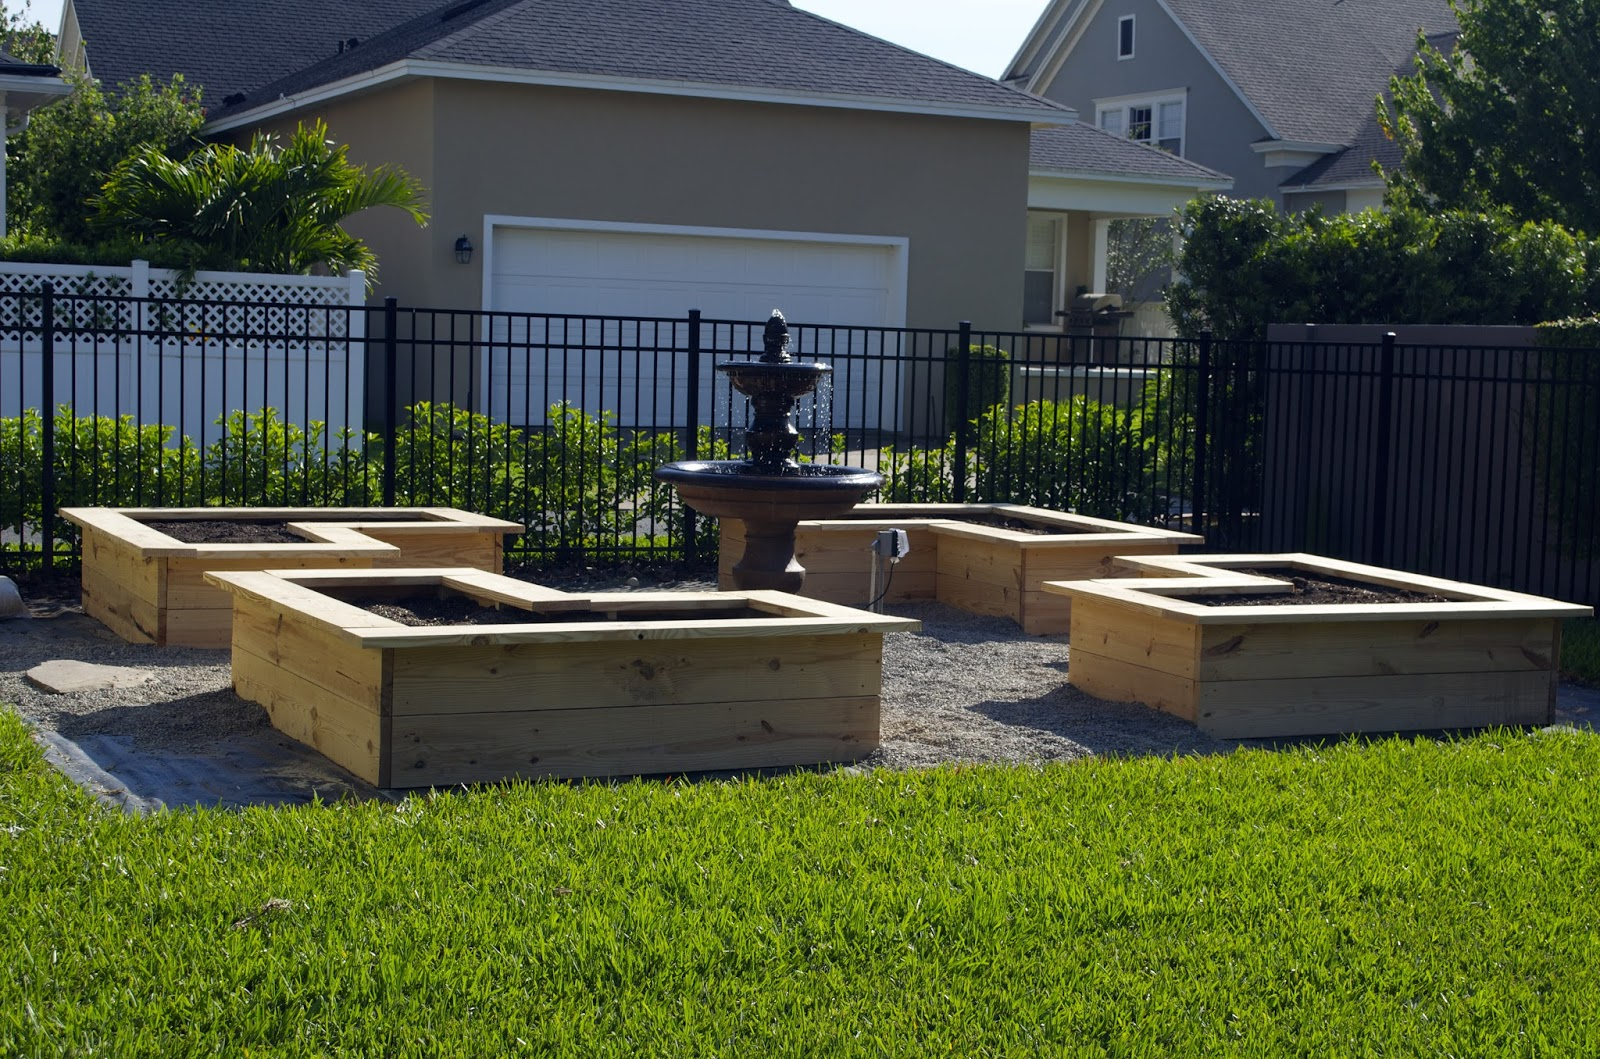 milkweed gardens our kitchen garden part ii. Black Bedroom Furniture Sets. Home Design Ideas